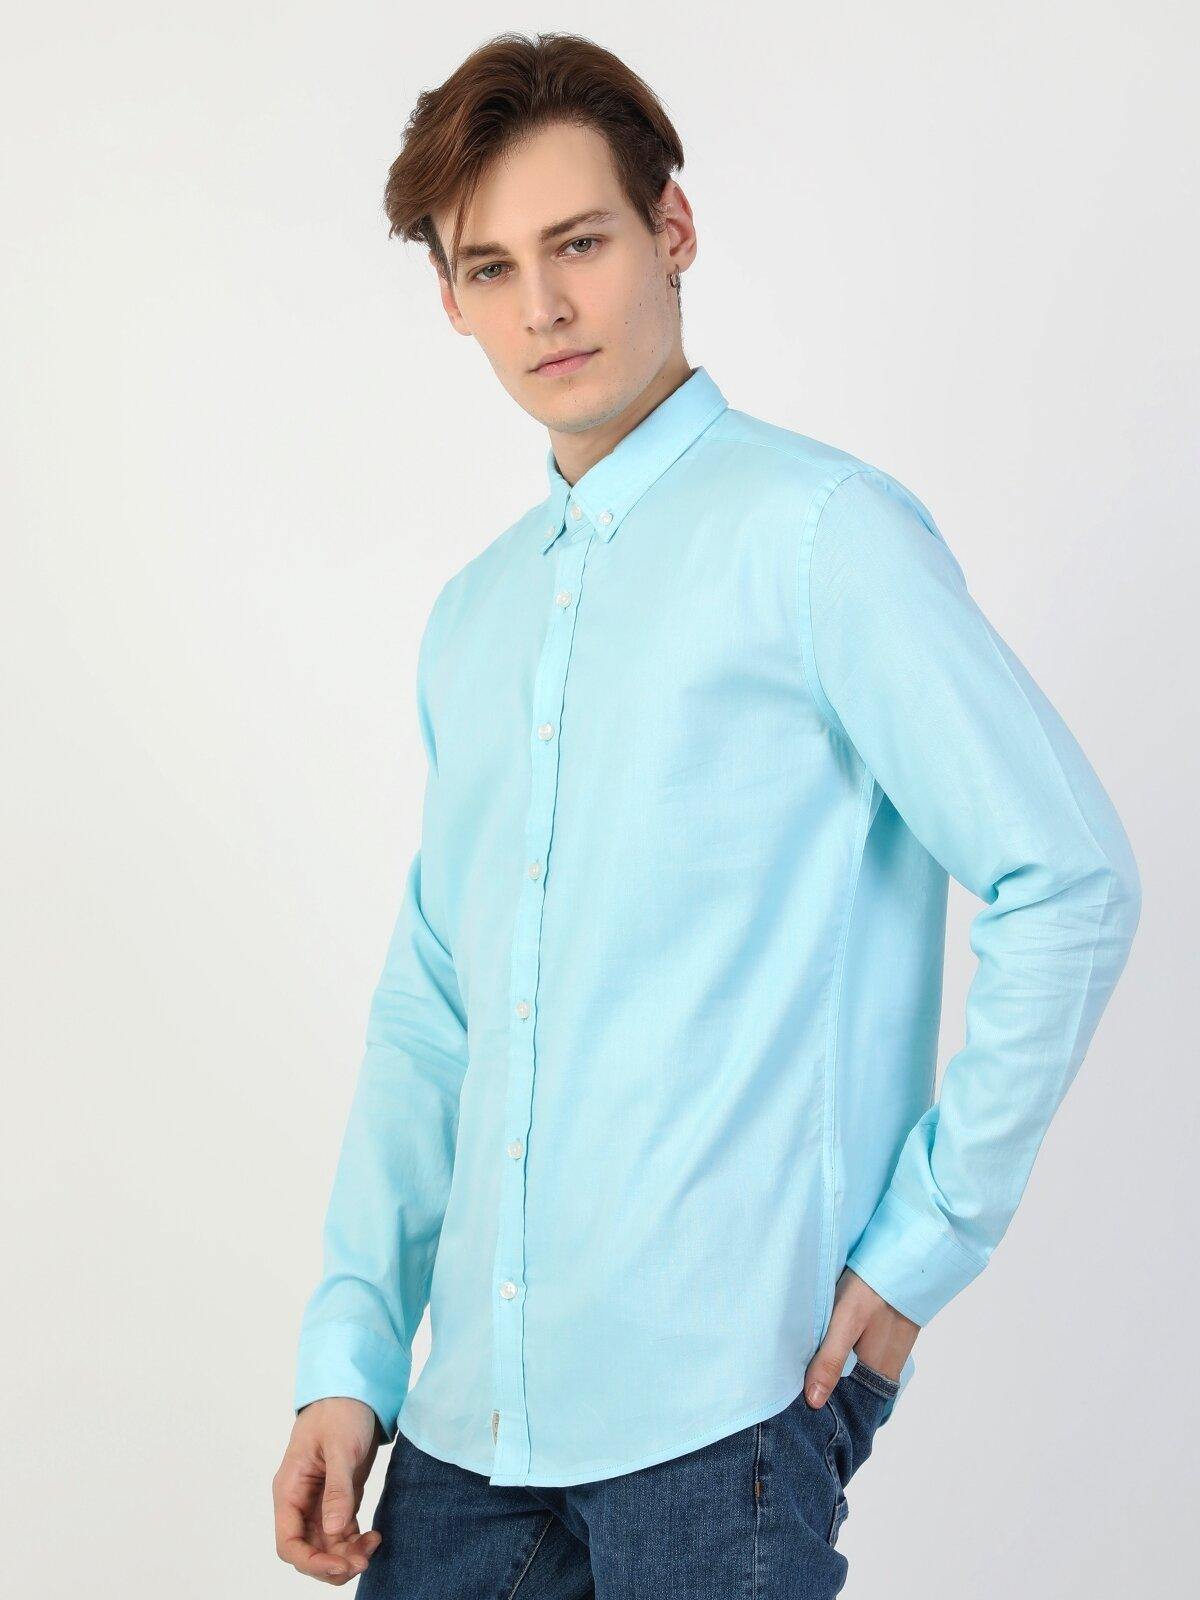 Slim Fit Shirt Neck Erkek Mint Yeşili Uzun Kol Gömlek